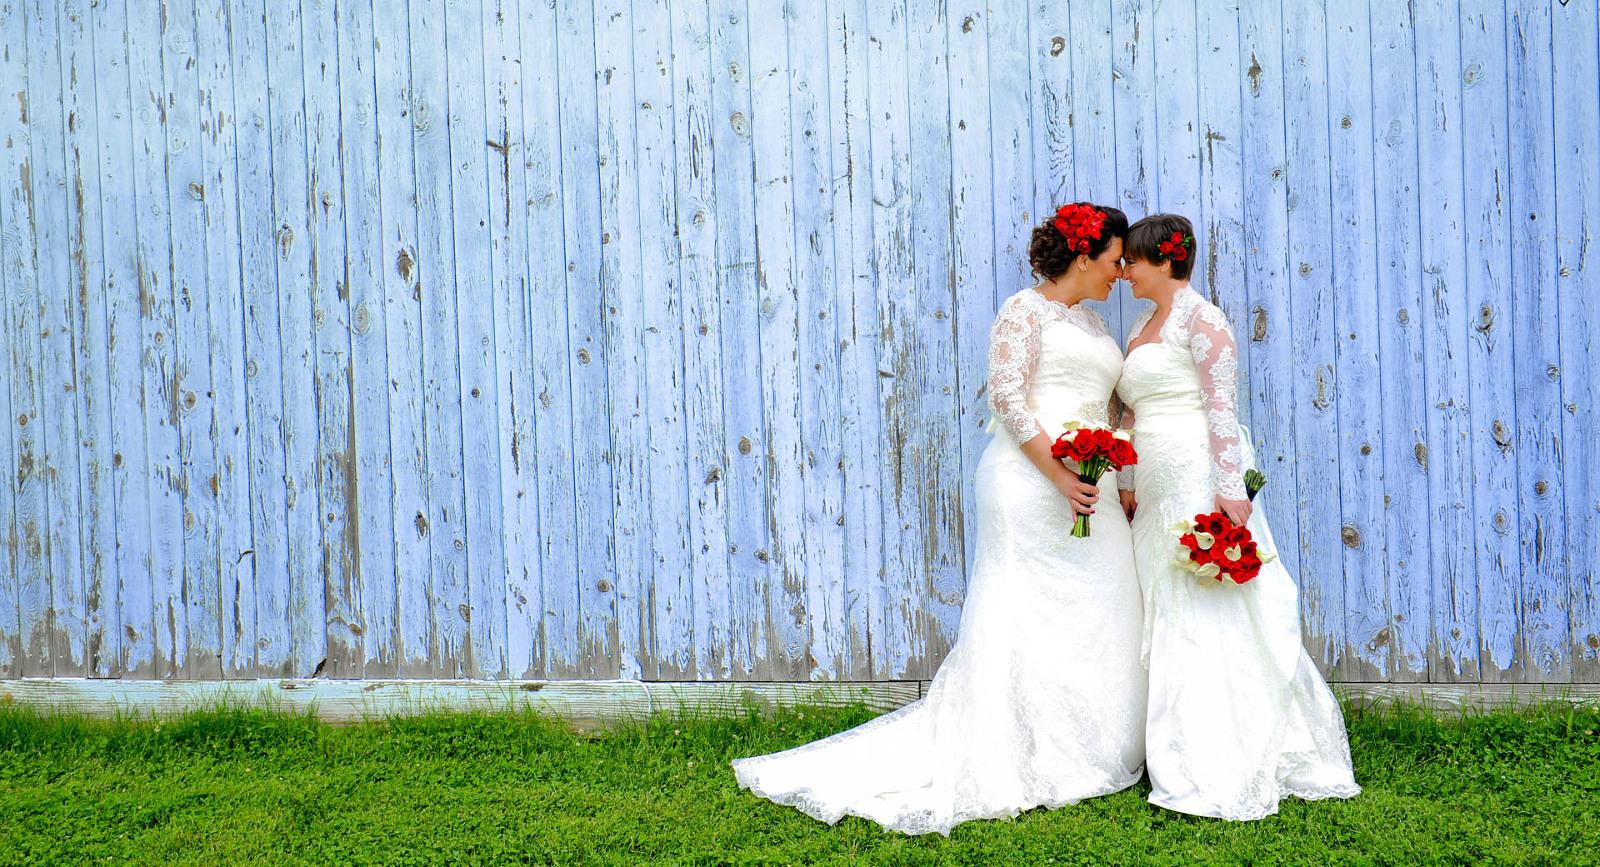 A same sex wedding couple celebrate their wedding in the Metro Detroit, Michigan area.